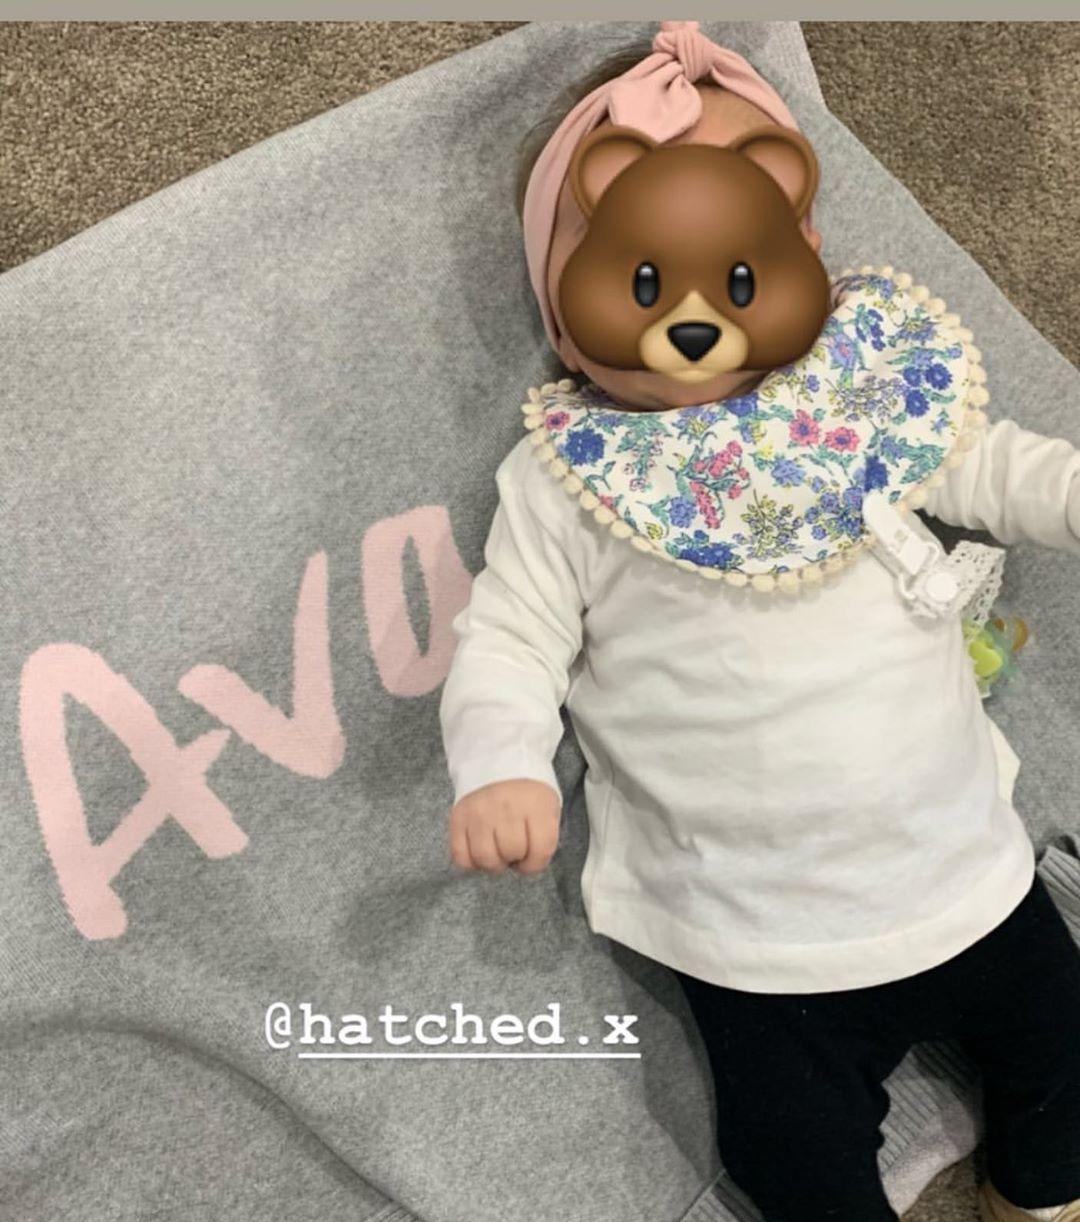 The cutest newest Hatched Bib, Ava 🥰 . Ava is wearing 𝓑𝓪𝓫𝔂 𝓑𝓵𝓾𝓮𝓼 Bebe Bib, Crochet Dummy Clio & Bebe Headband 🥰🥰🥰 . Thank You @rania.xriri  for sharing . .